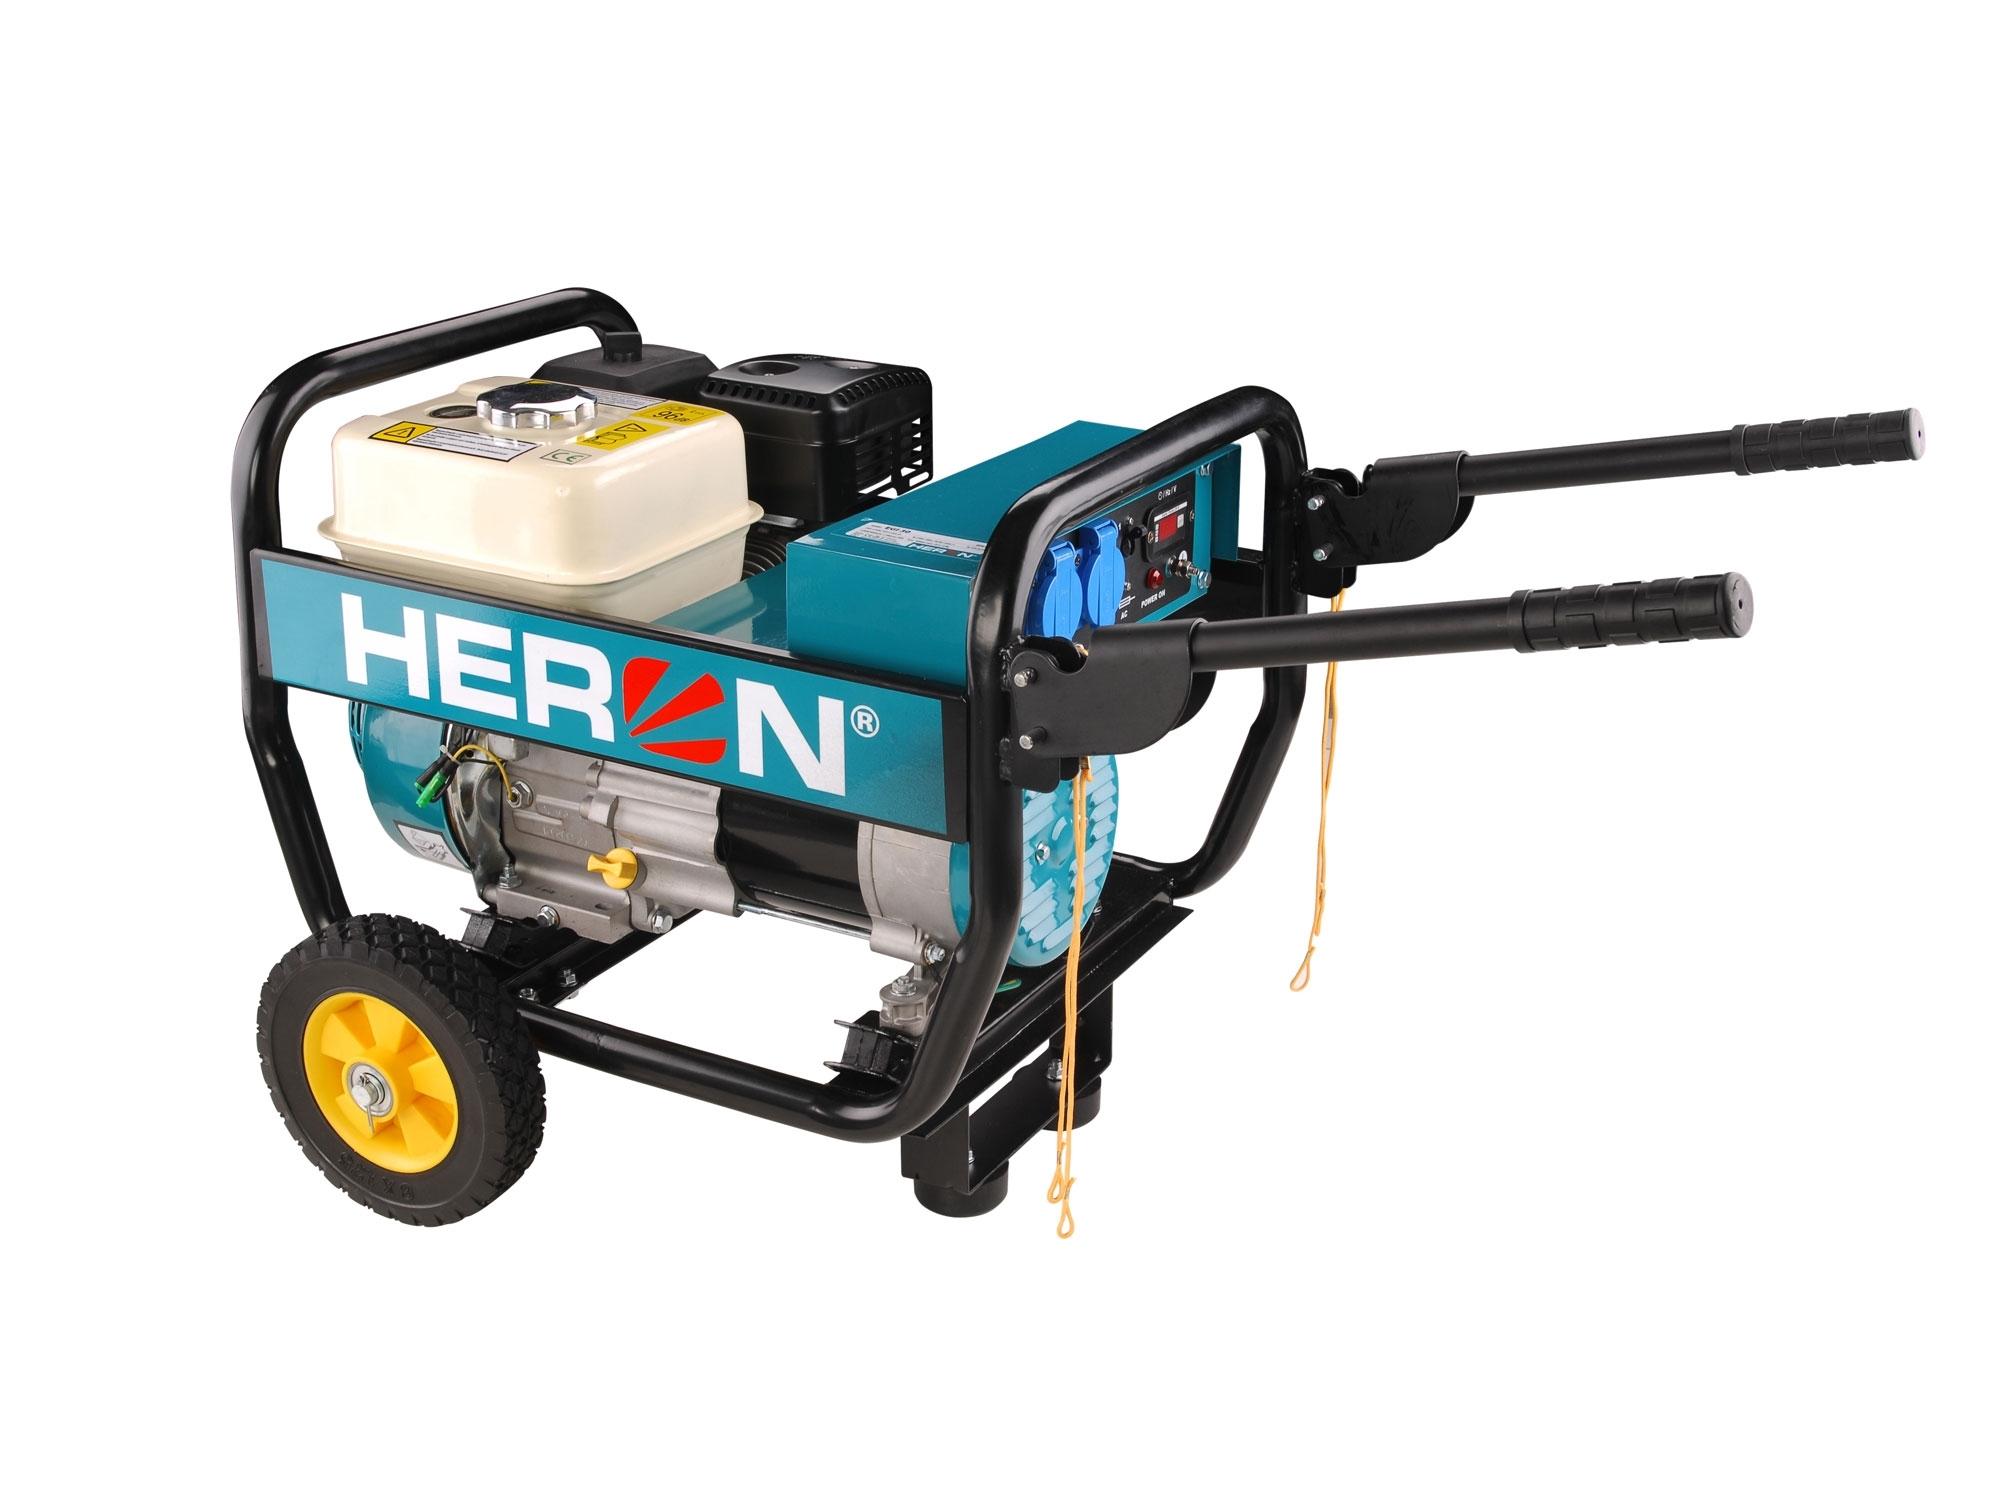 HERON elektrocentrála benzínová 6,5HP/2,8kW, industriální